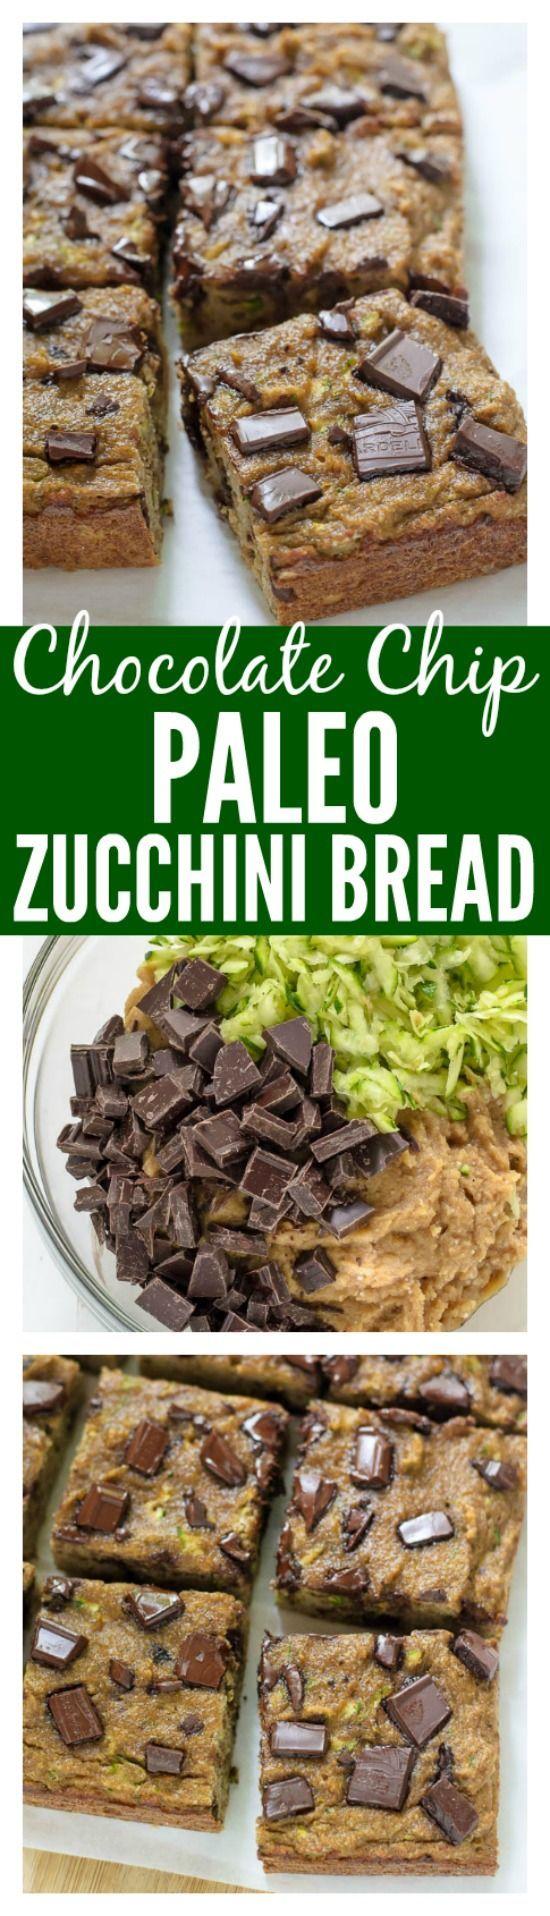 Chip Paleo Zucchini Bread. Grain free, dairy free, and naturally sweetened!